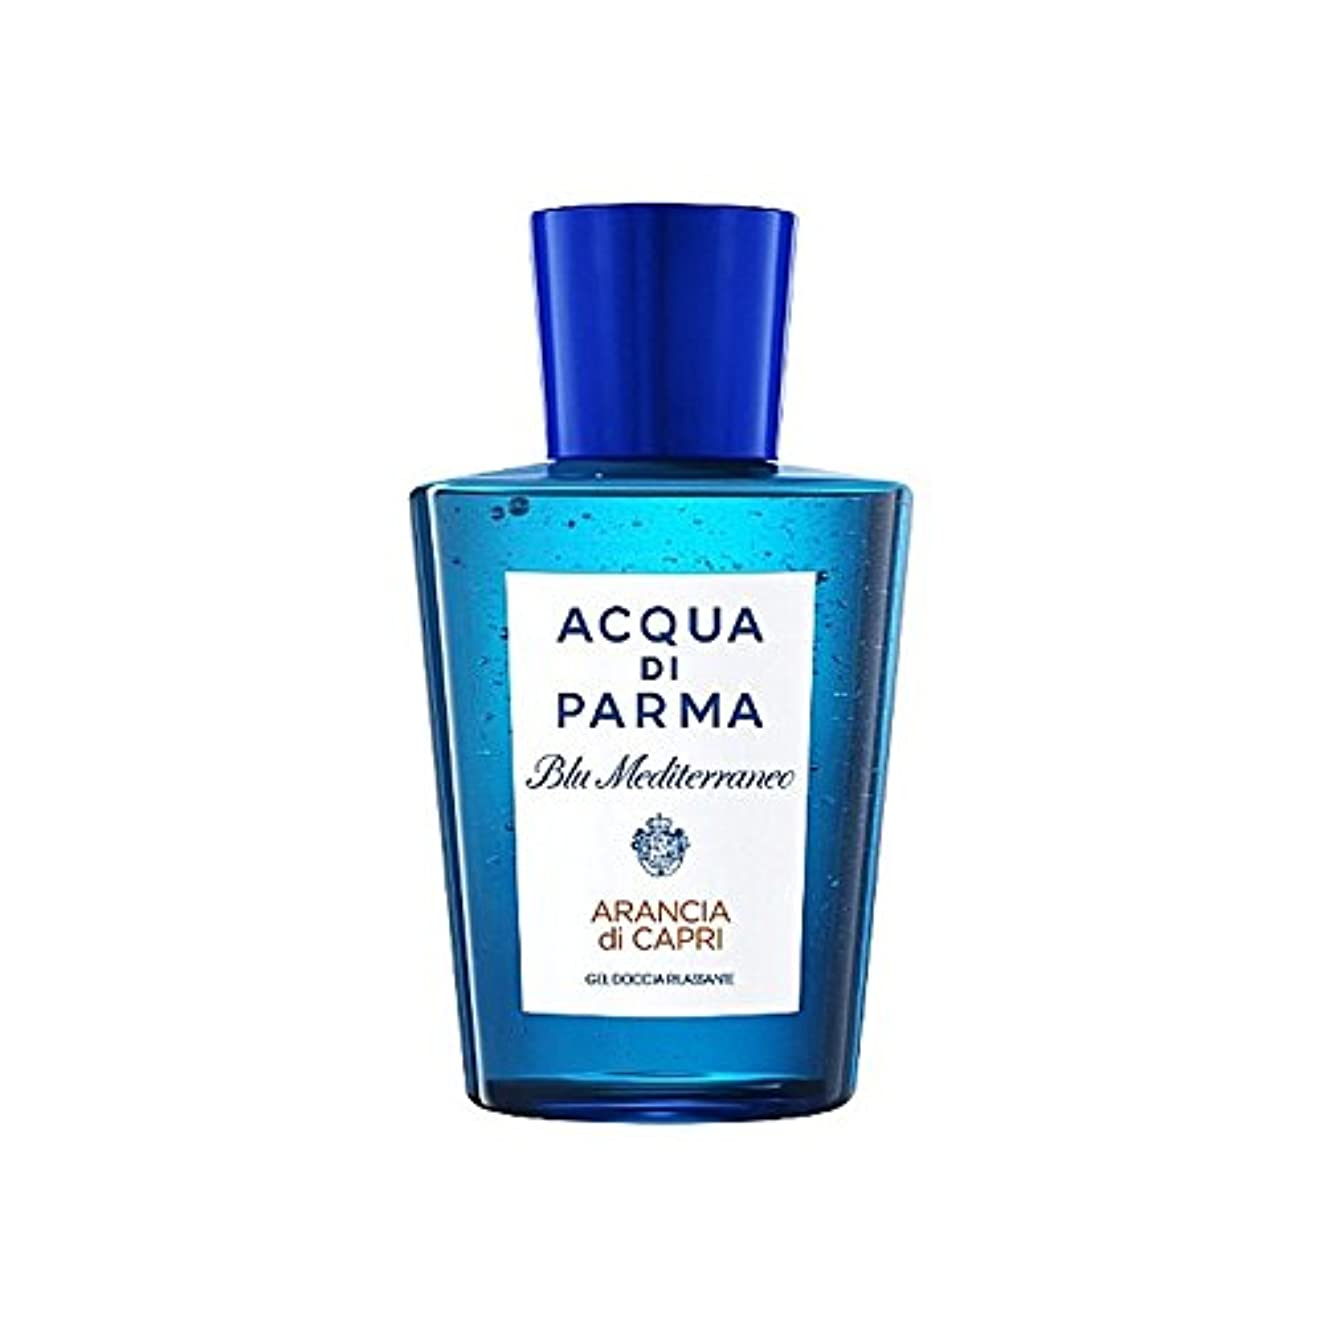 Acqua Di Parma Blu Mediterraneo Arancia Di Capri Shower Gel 200ml - アクアディパルマブルーメディのアランシアジカプリシャワージェル200 [並行輸入品]